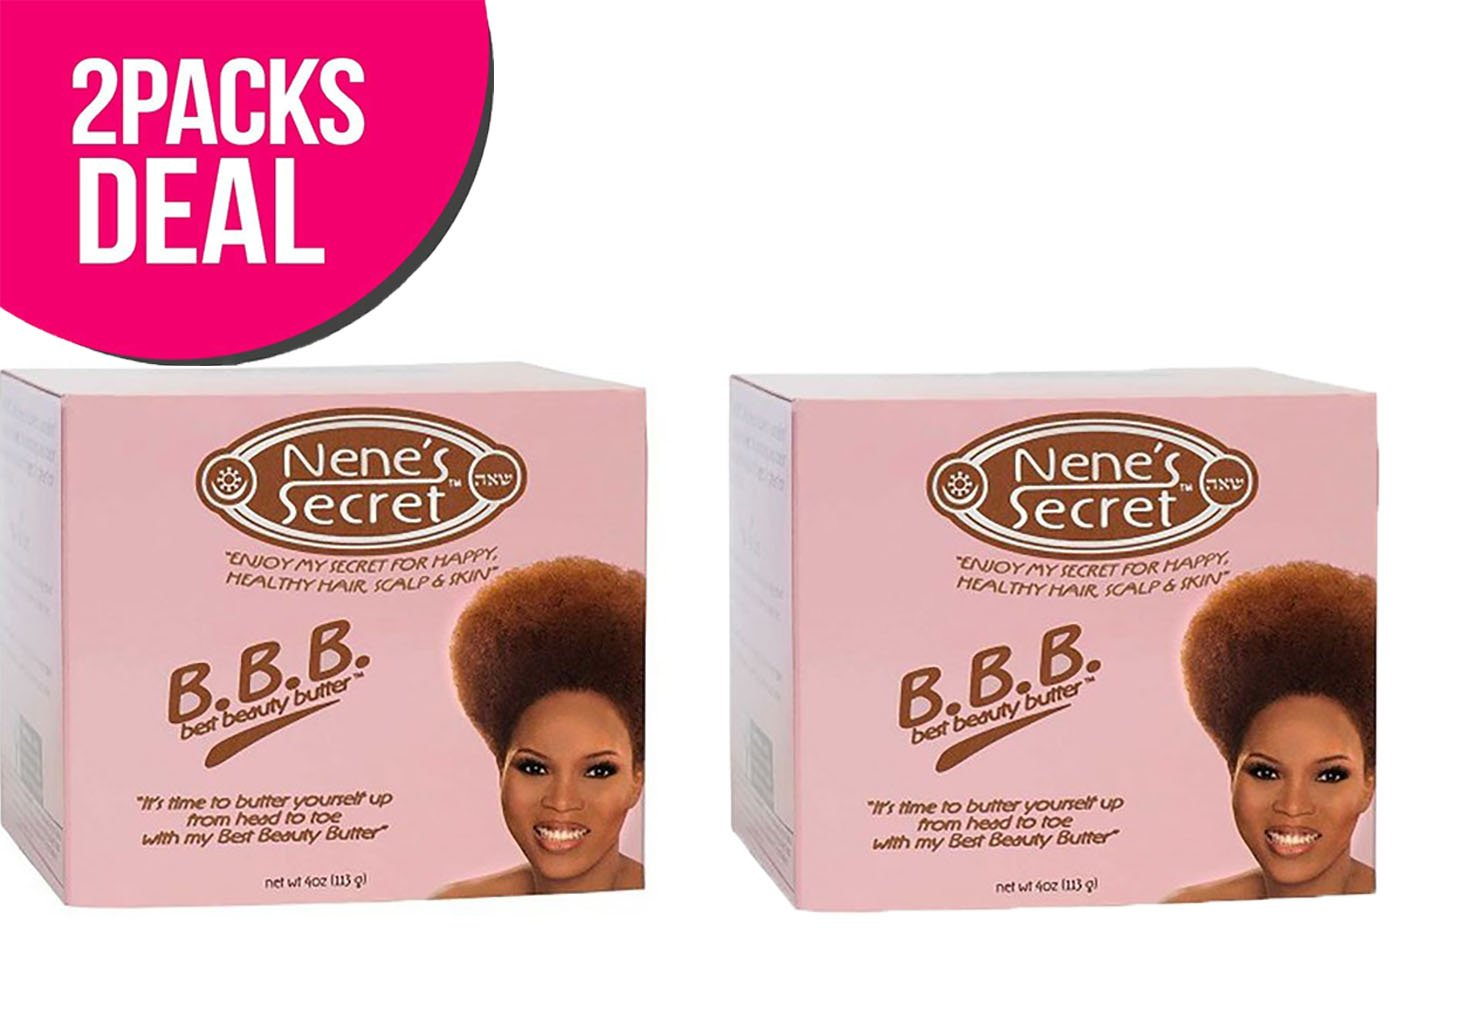 (2 PACK) Nene's Secret Best Beauty Butter 4 oz